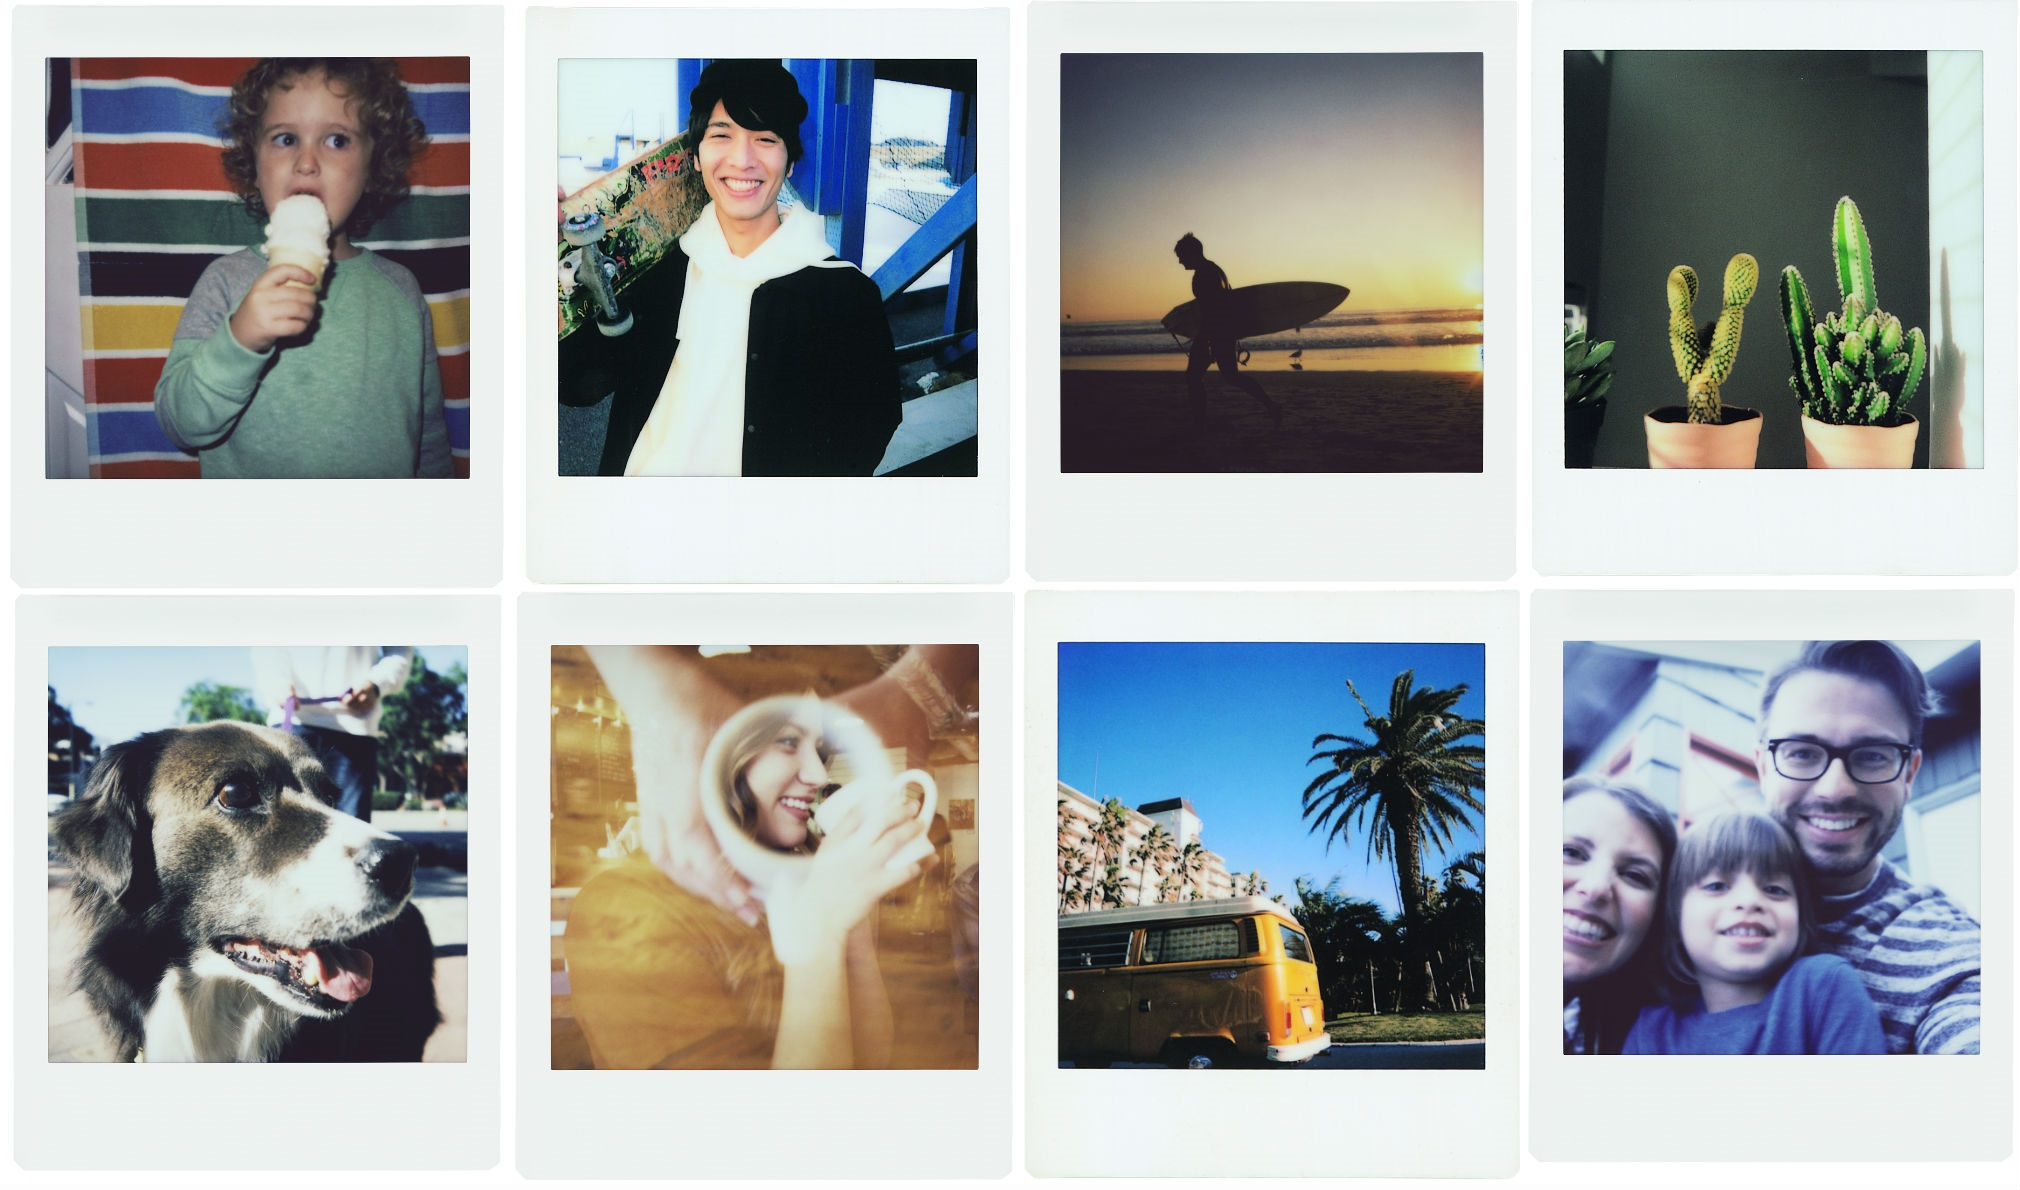 Fujifilm Instax SQ6 Square Taylor Swift; instantní fotografie;